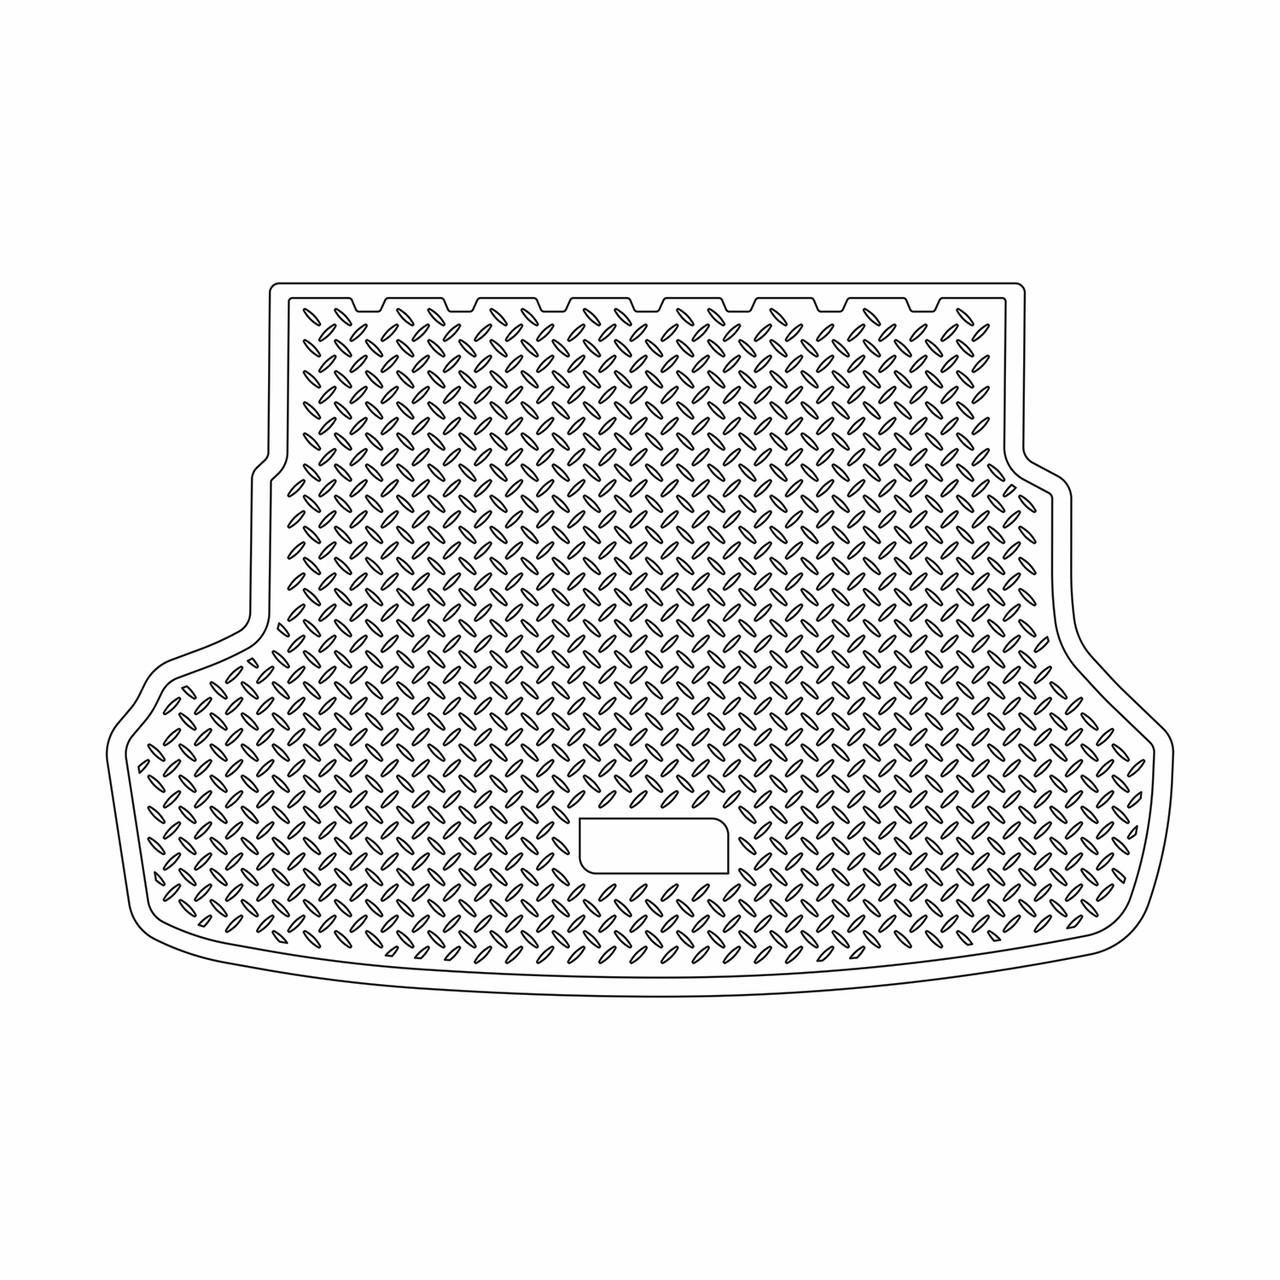 Коврик в багажник Kia Rio седан (2011-2016)